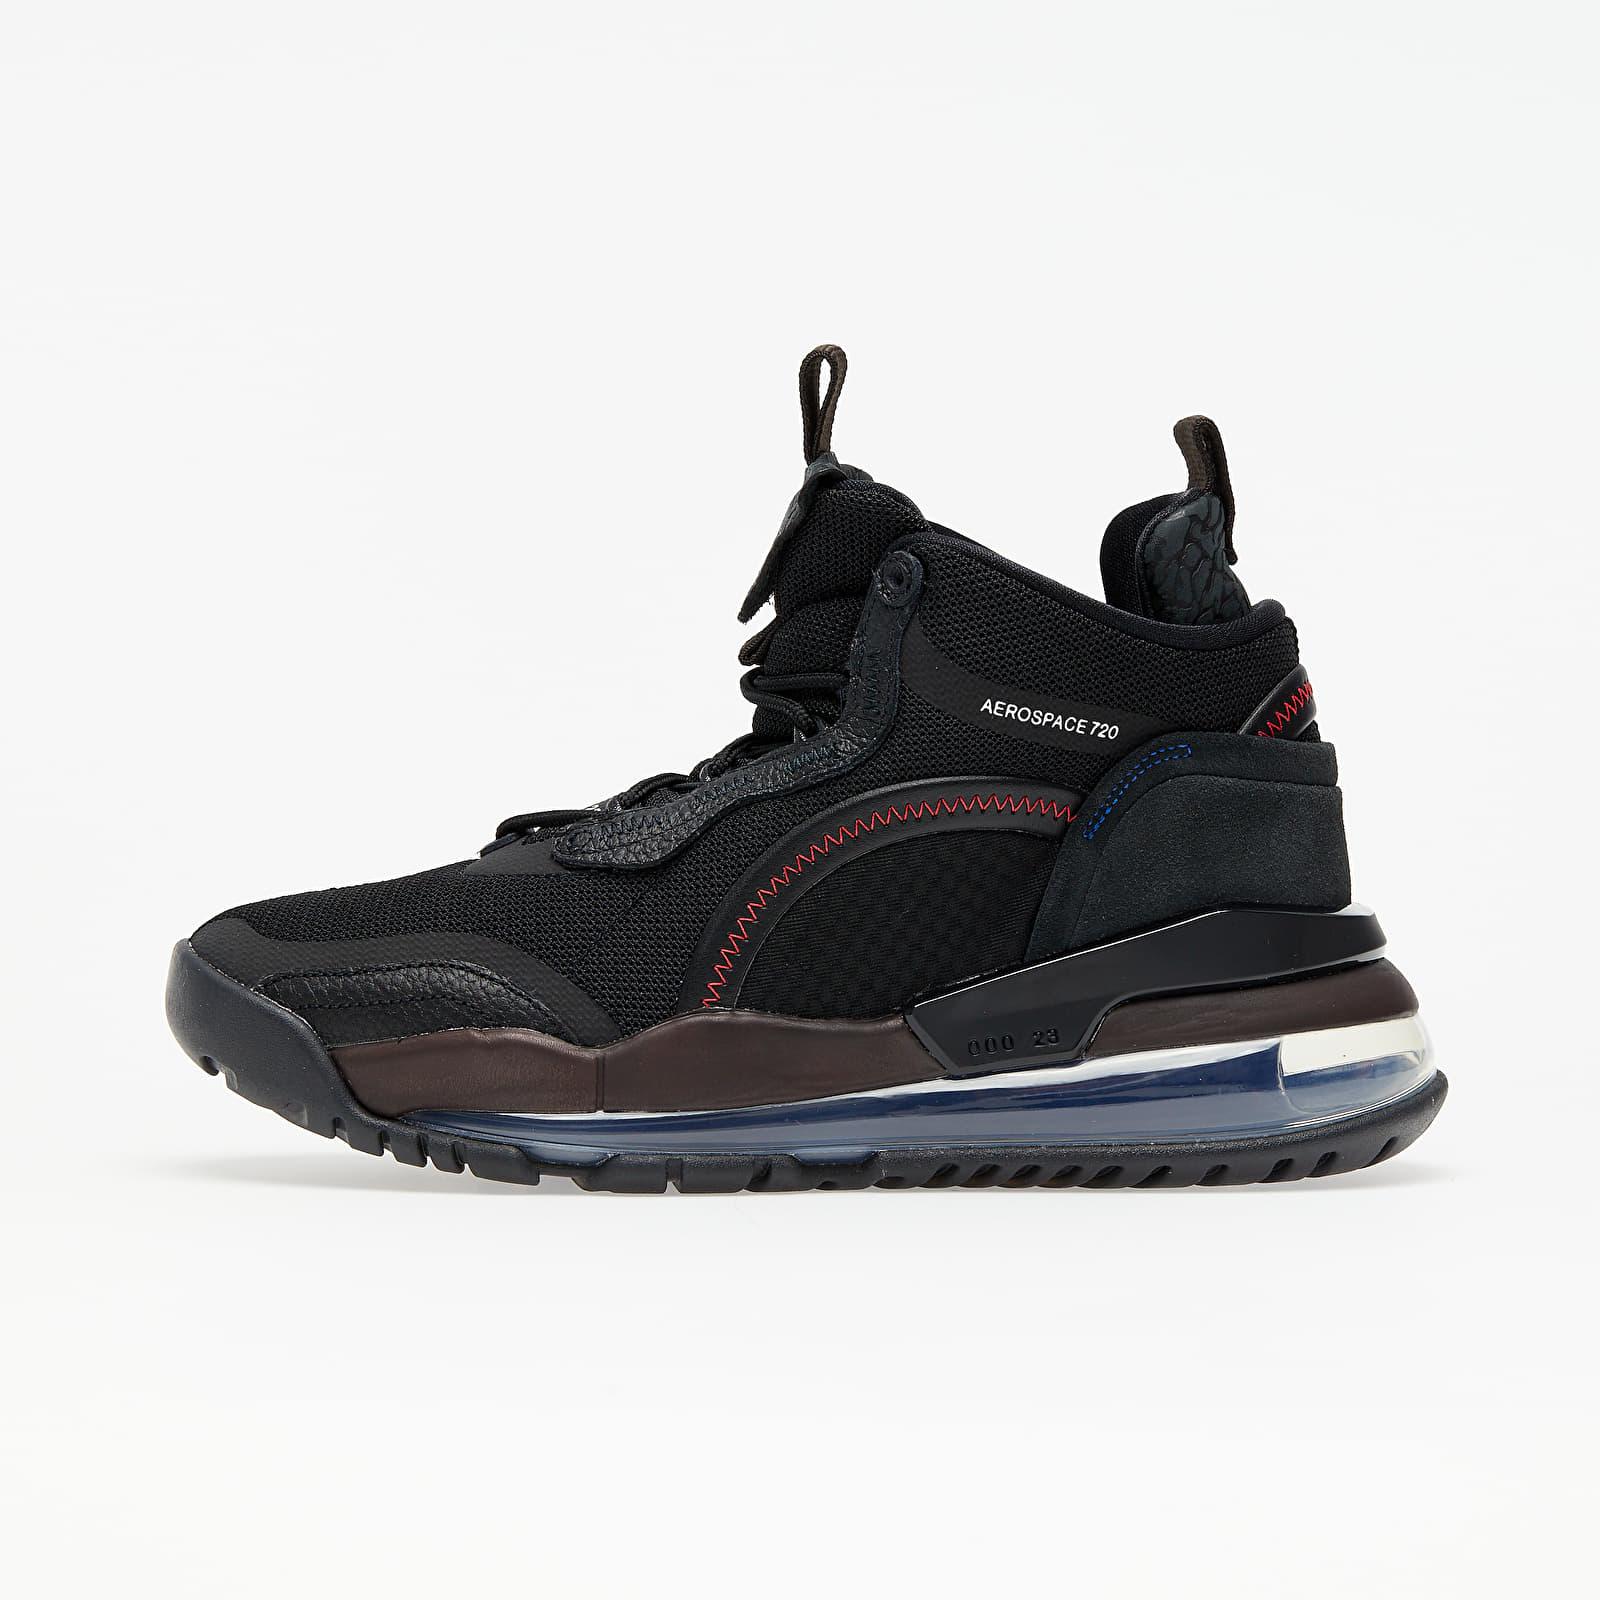 Férfi cipők Jordan Aerospace 720 Black/ White-Dk Smoke Grey-Velvet Brown